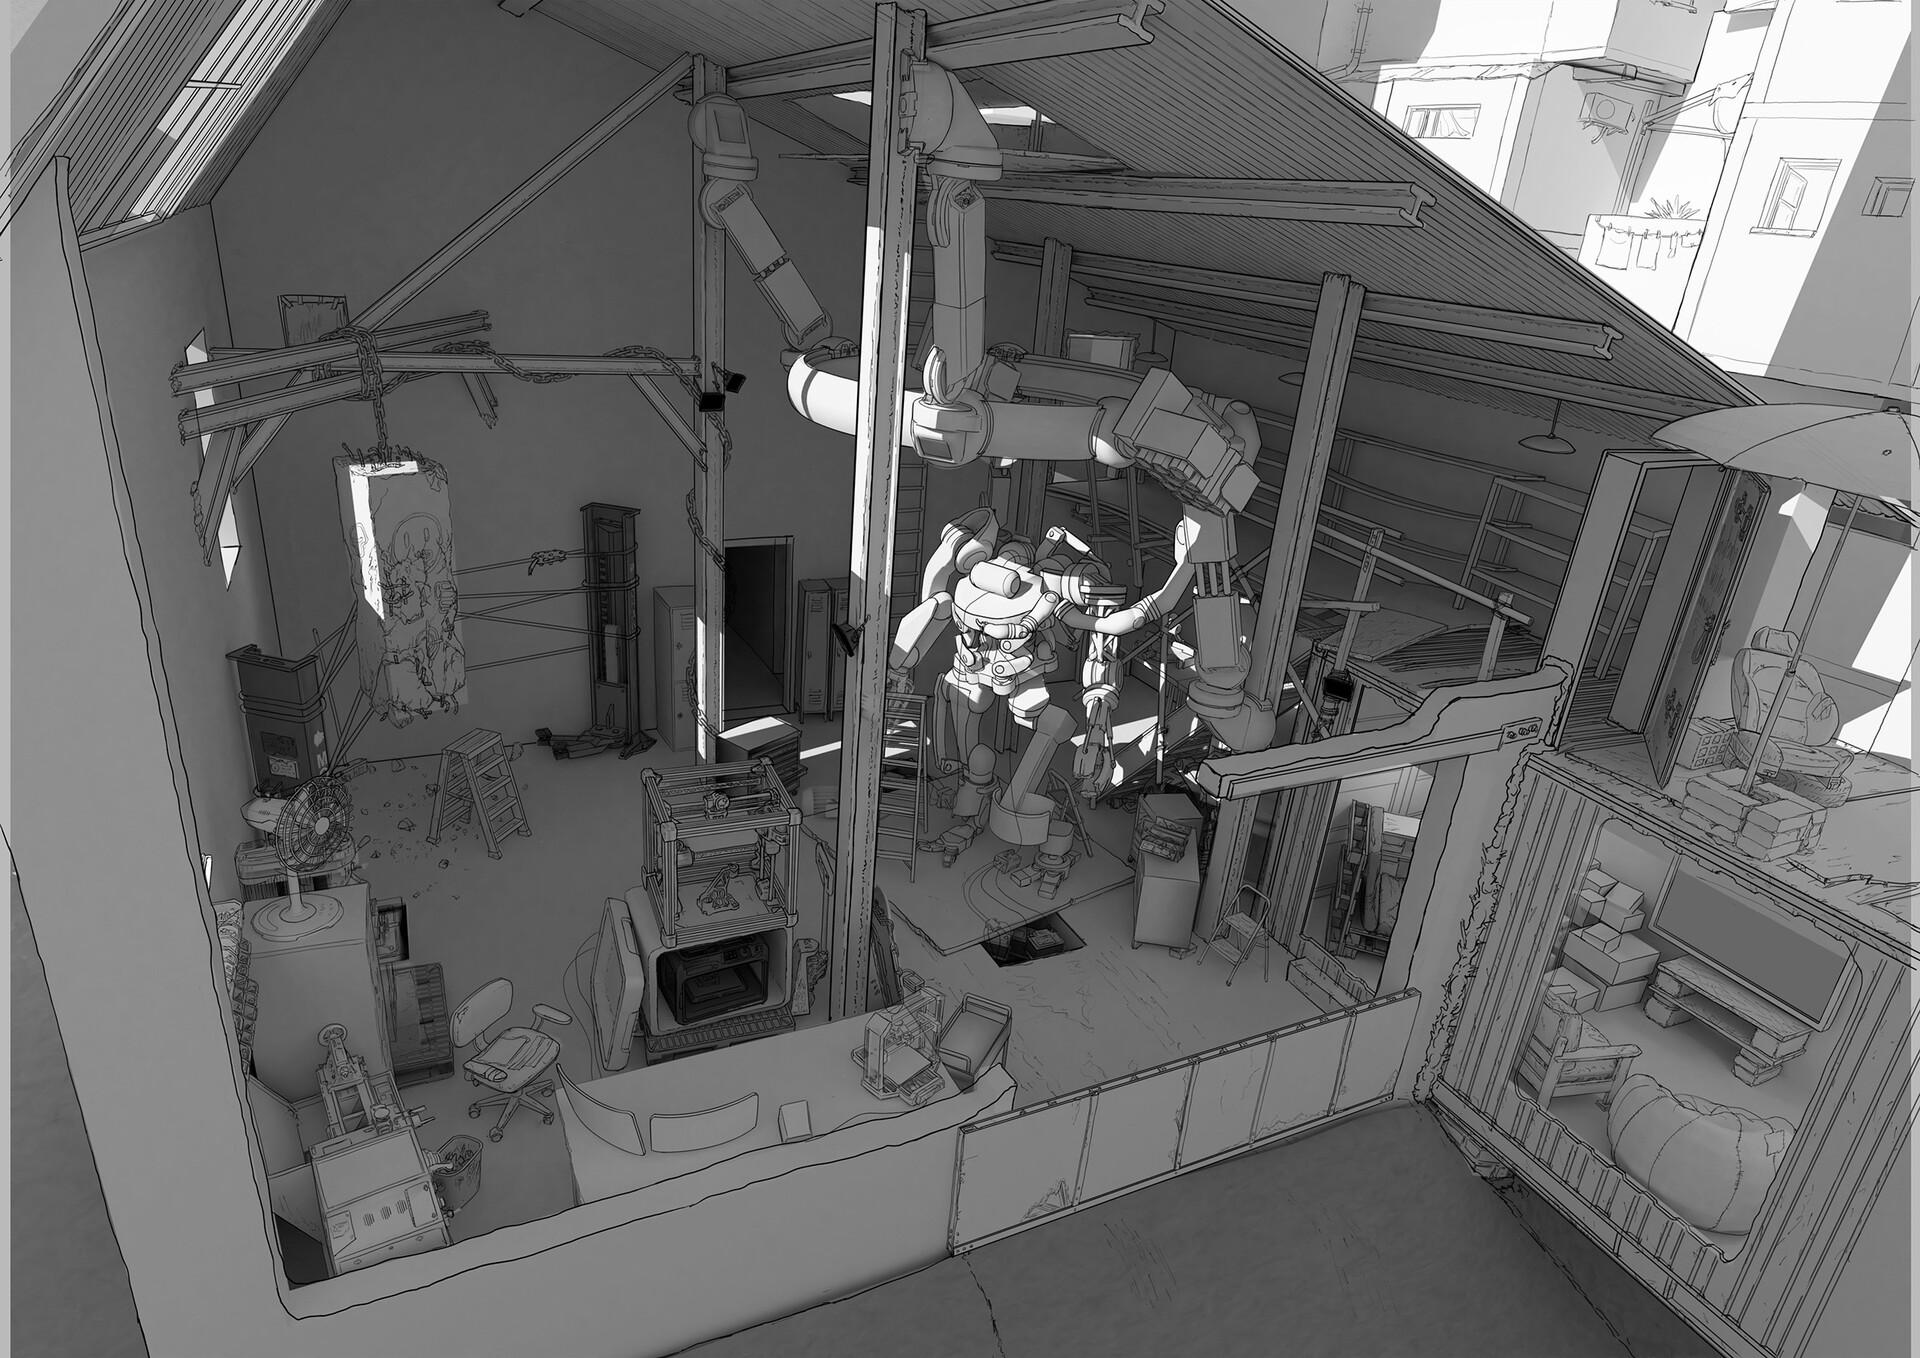 Francis goeltner m4 herokidshome workshop34 workshop viscom01 wip02x m